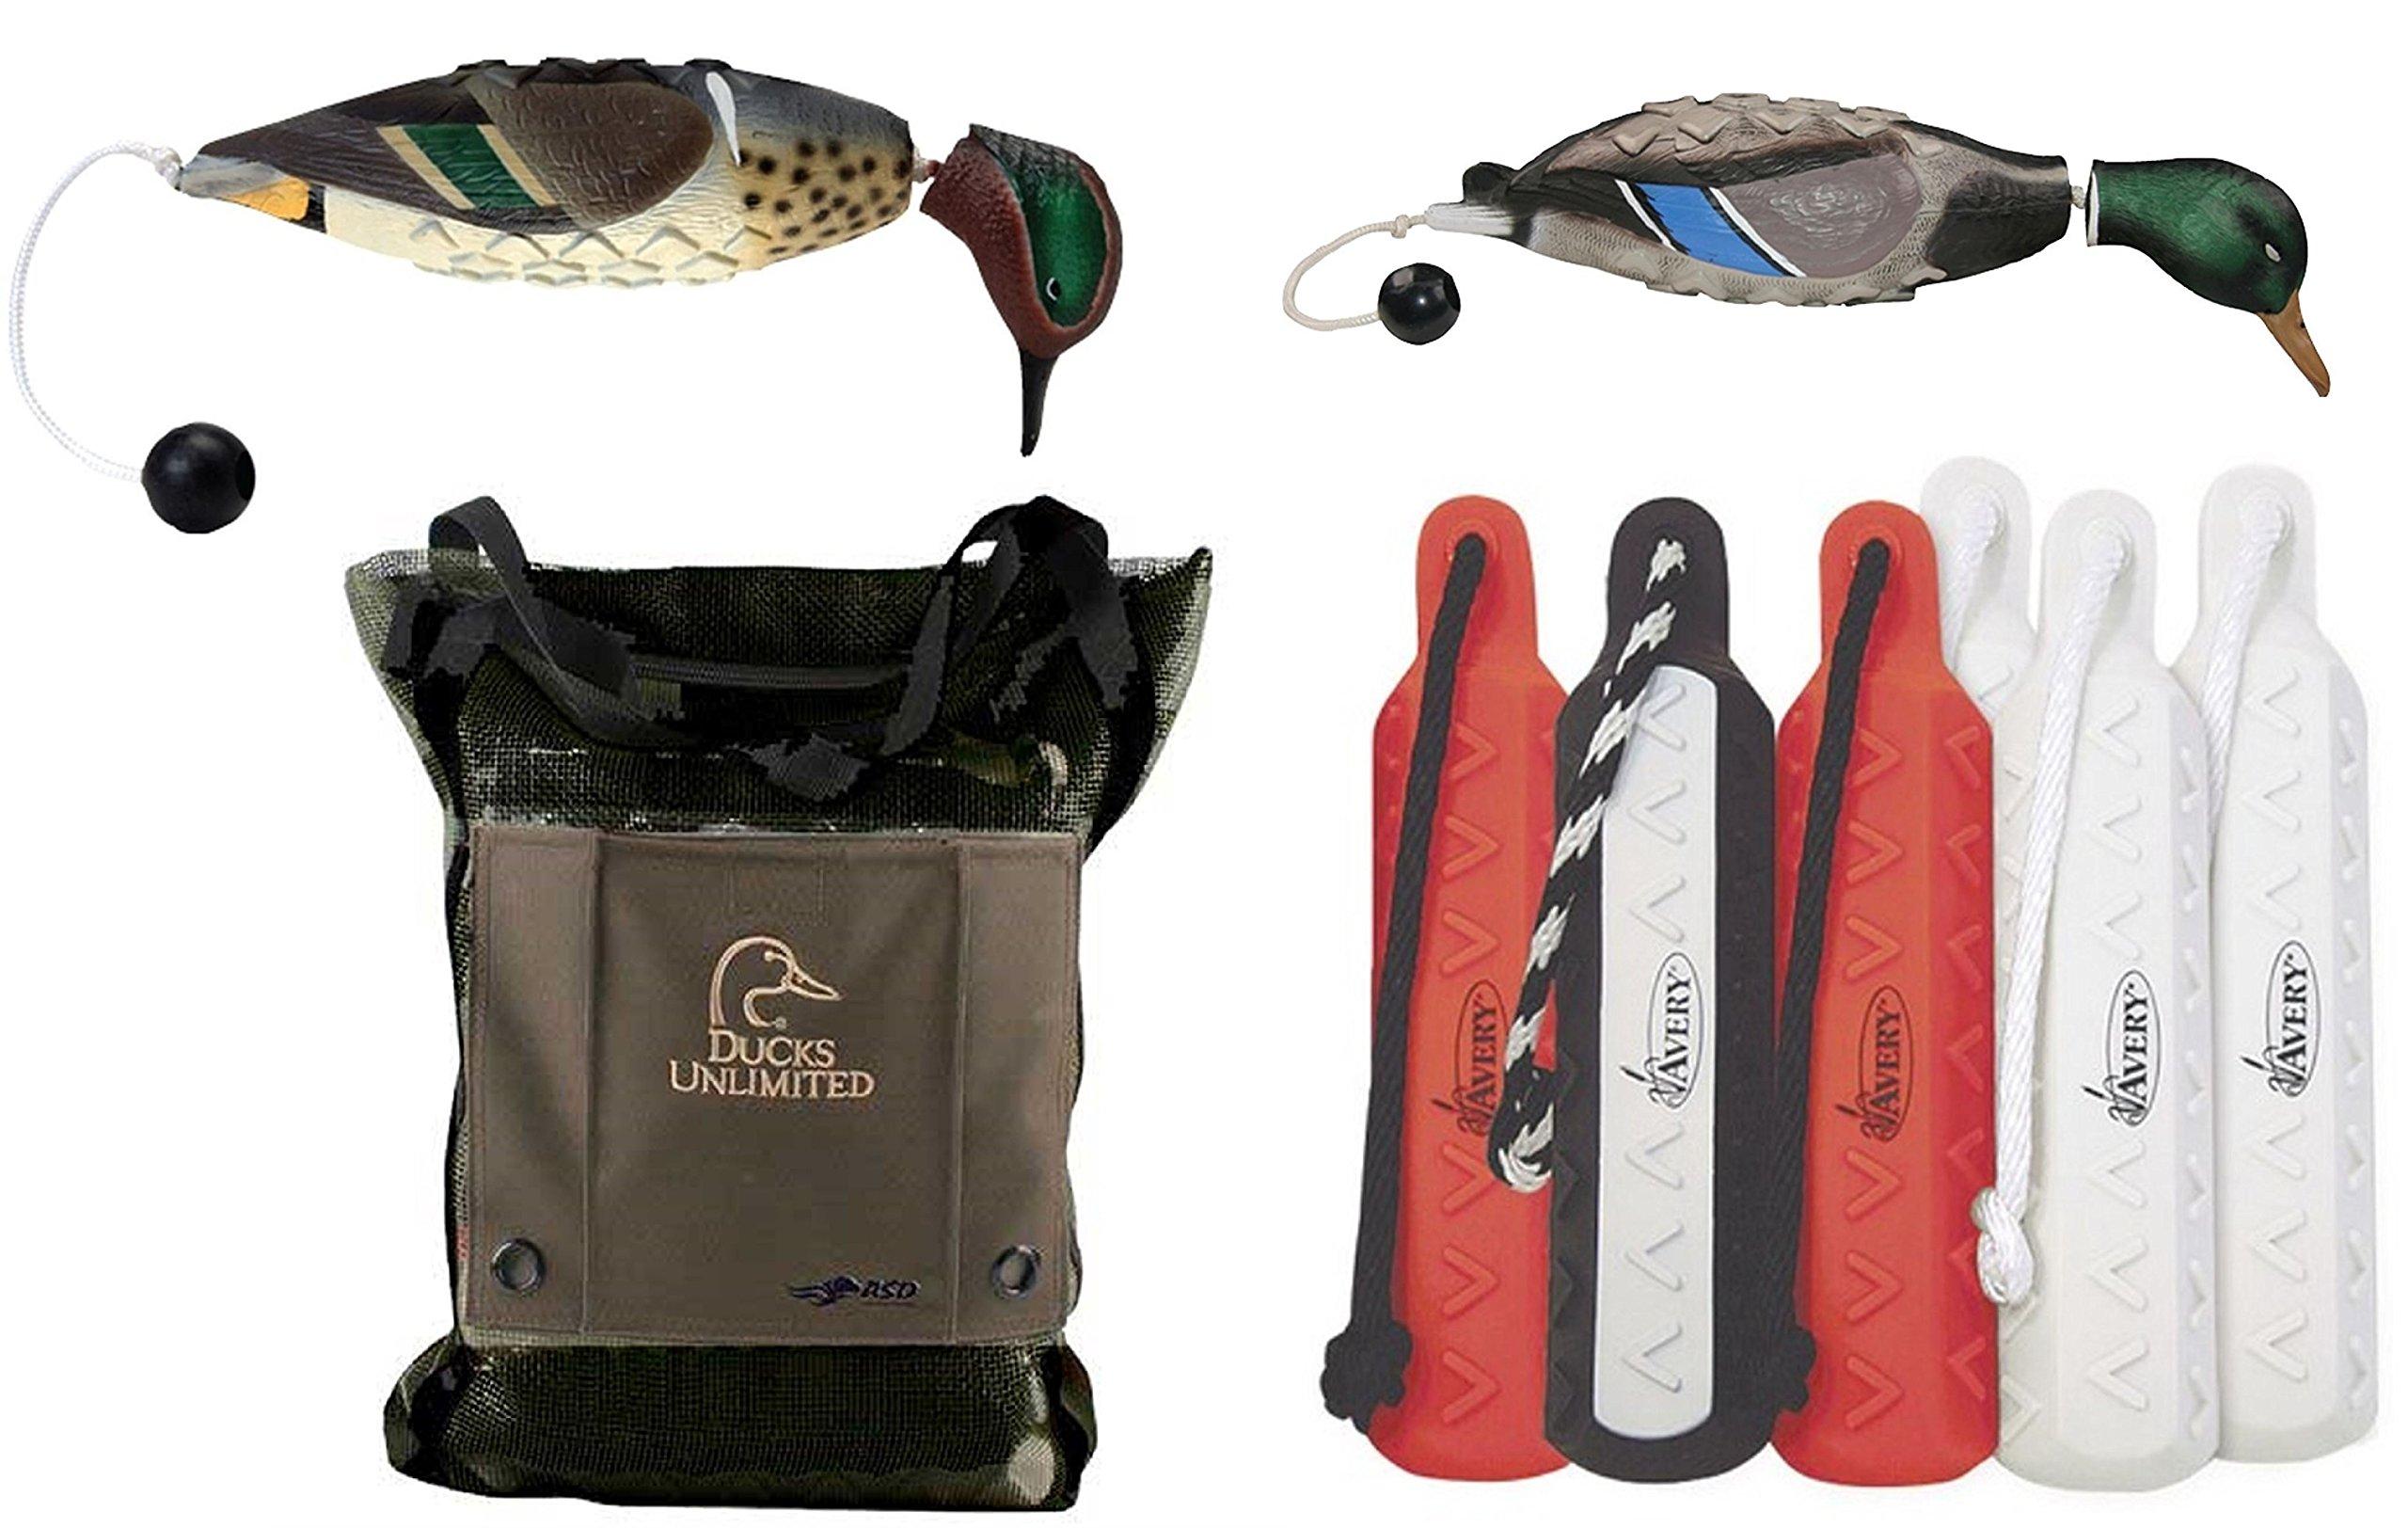 Avery Teal Dog Training EZ-Bird Training Dummy , Mallard ATB EZ-Bird Dog Training Dummy , Sporting Dog Bumper/Bird Bag, 2'' Hexa-Bumper Pro Pack